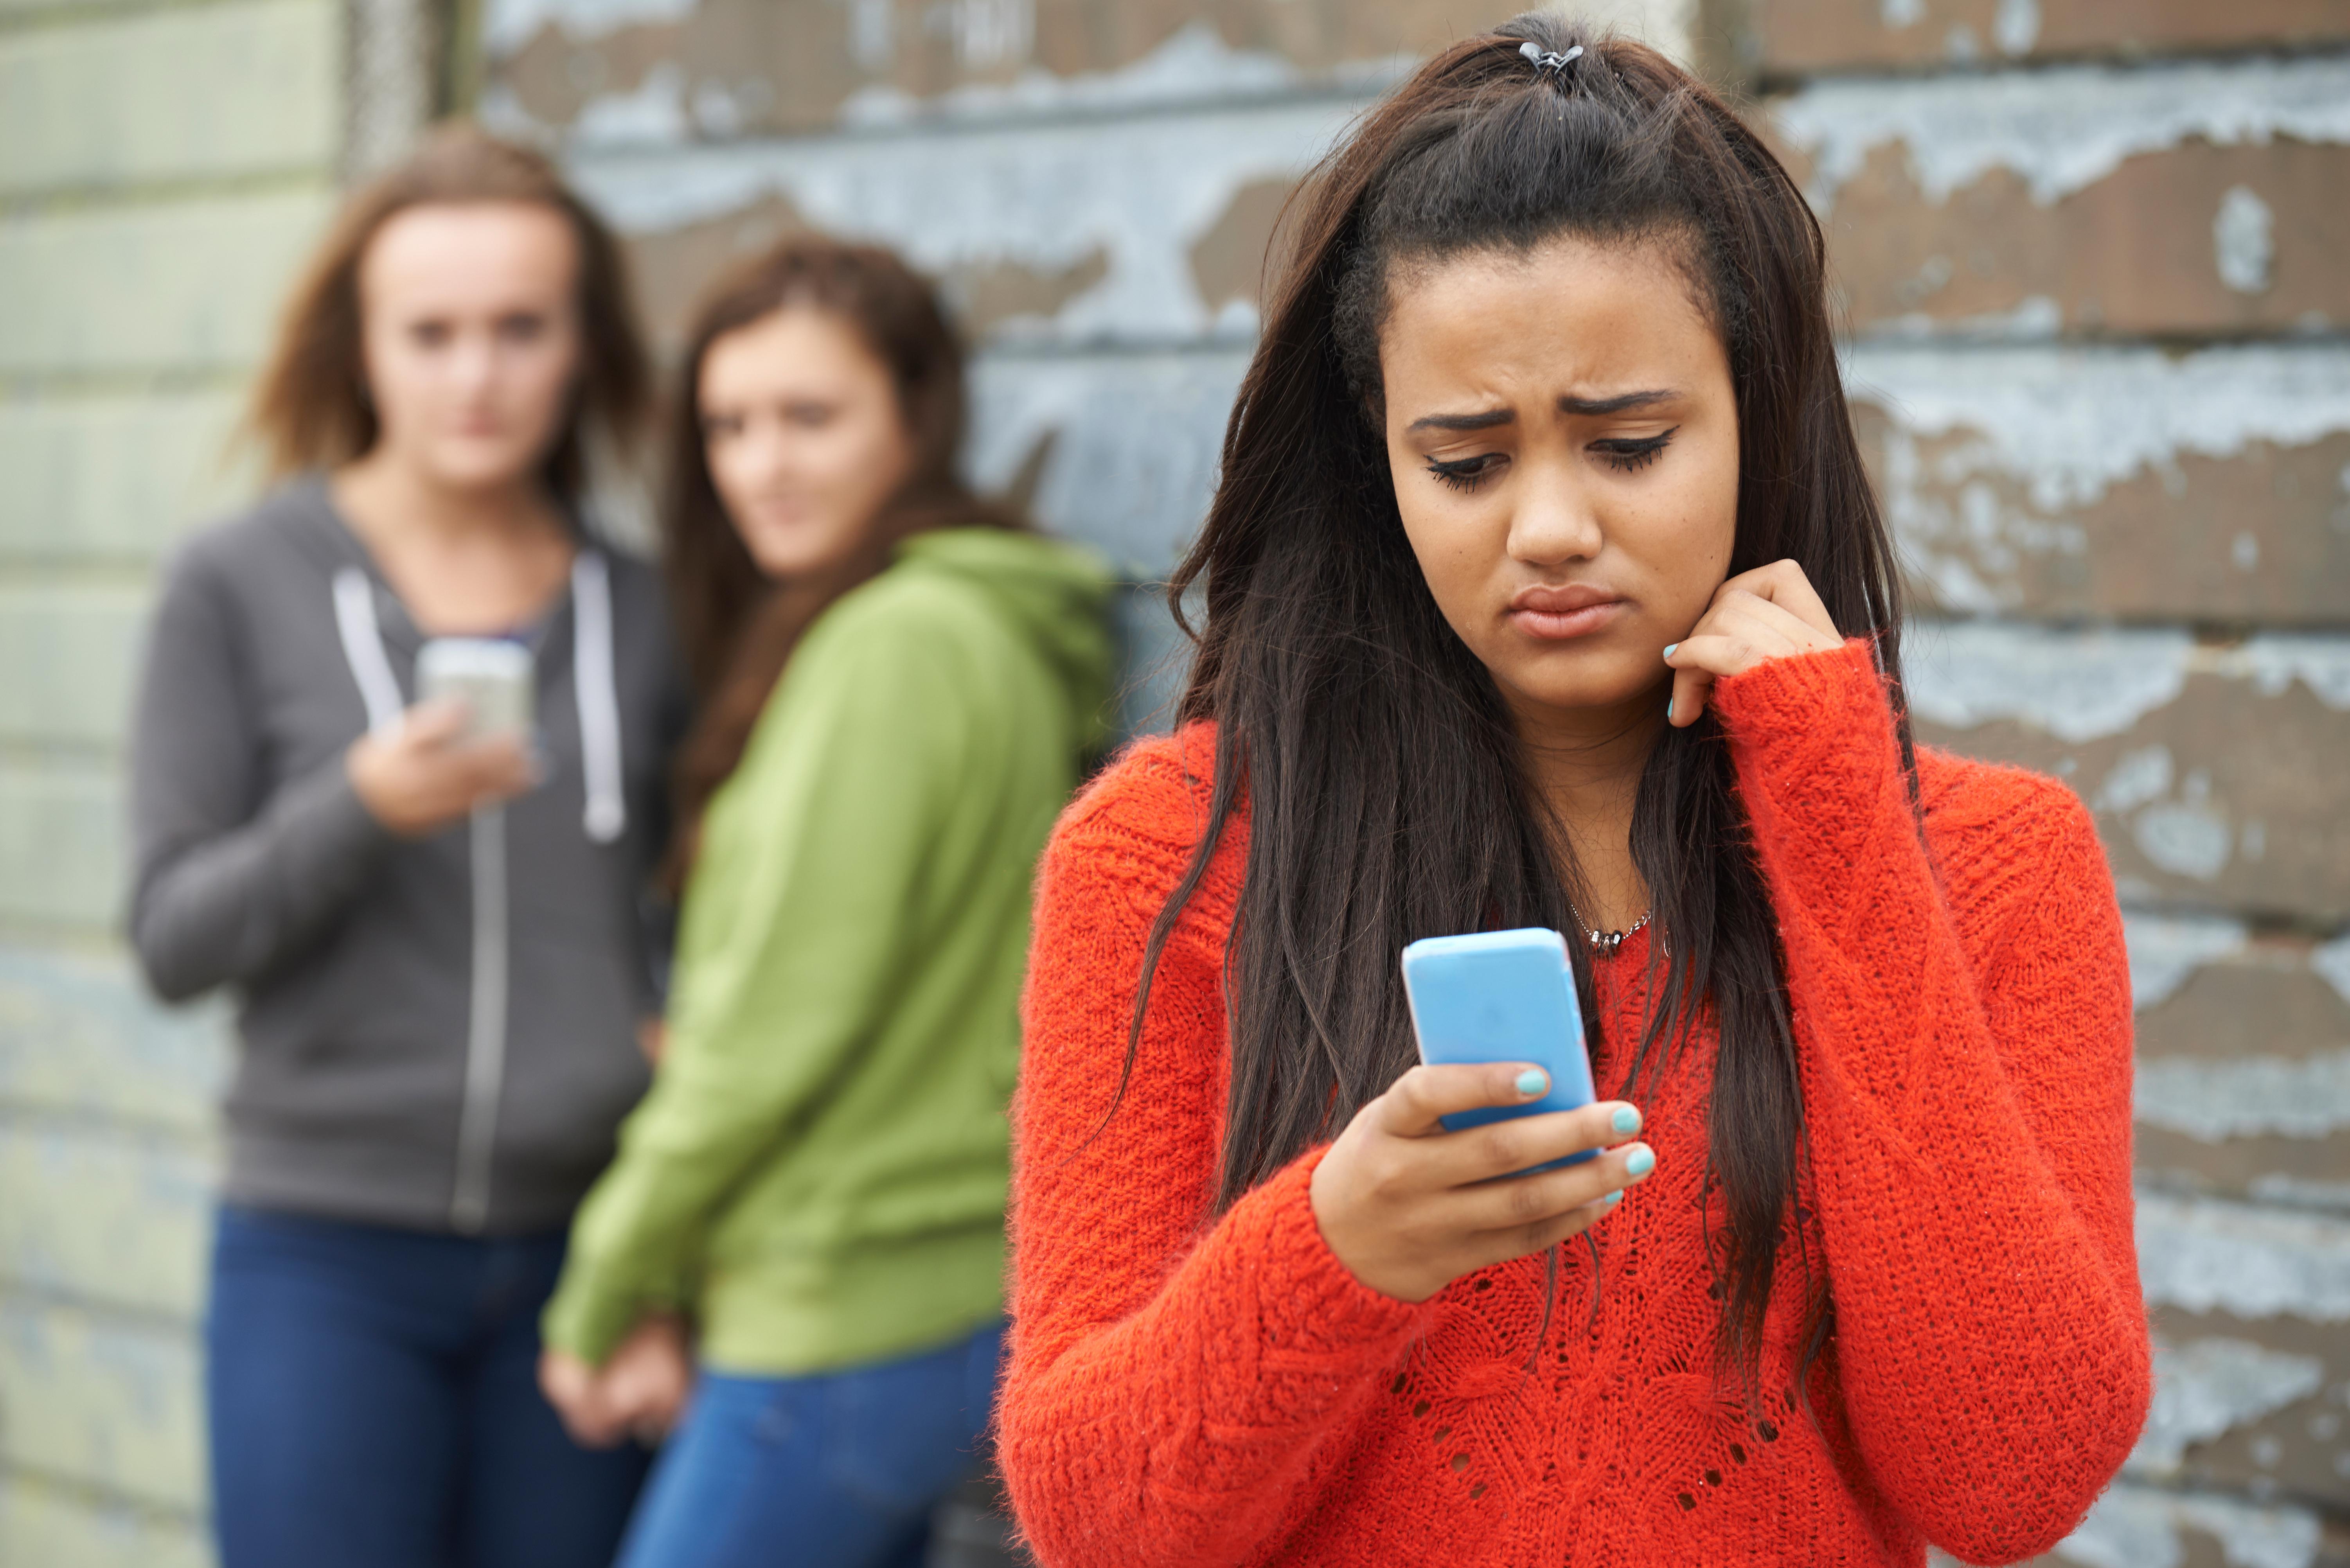 Teenage Girl Being Bullied By Text Message. SpeedKingz/Shutterstock